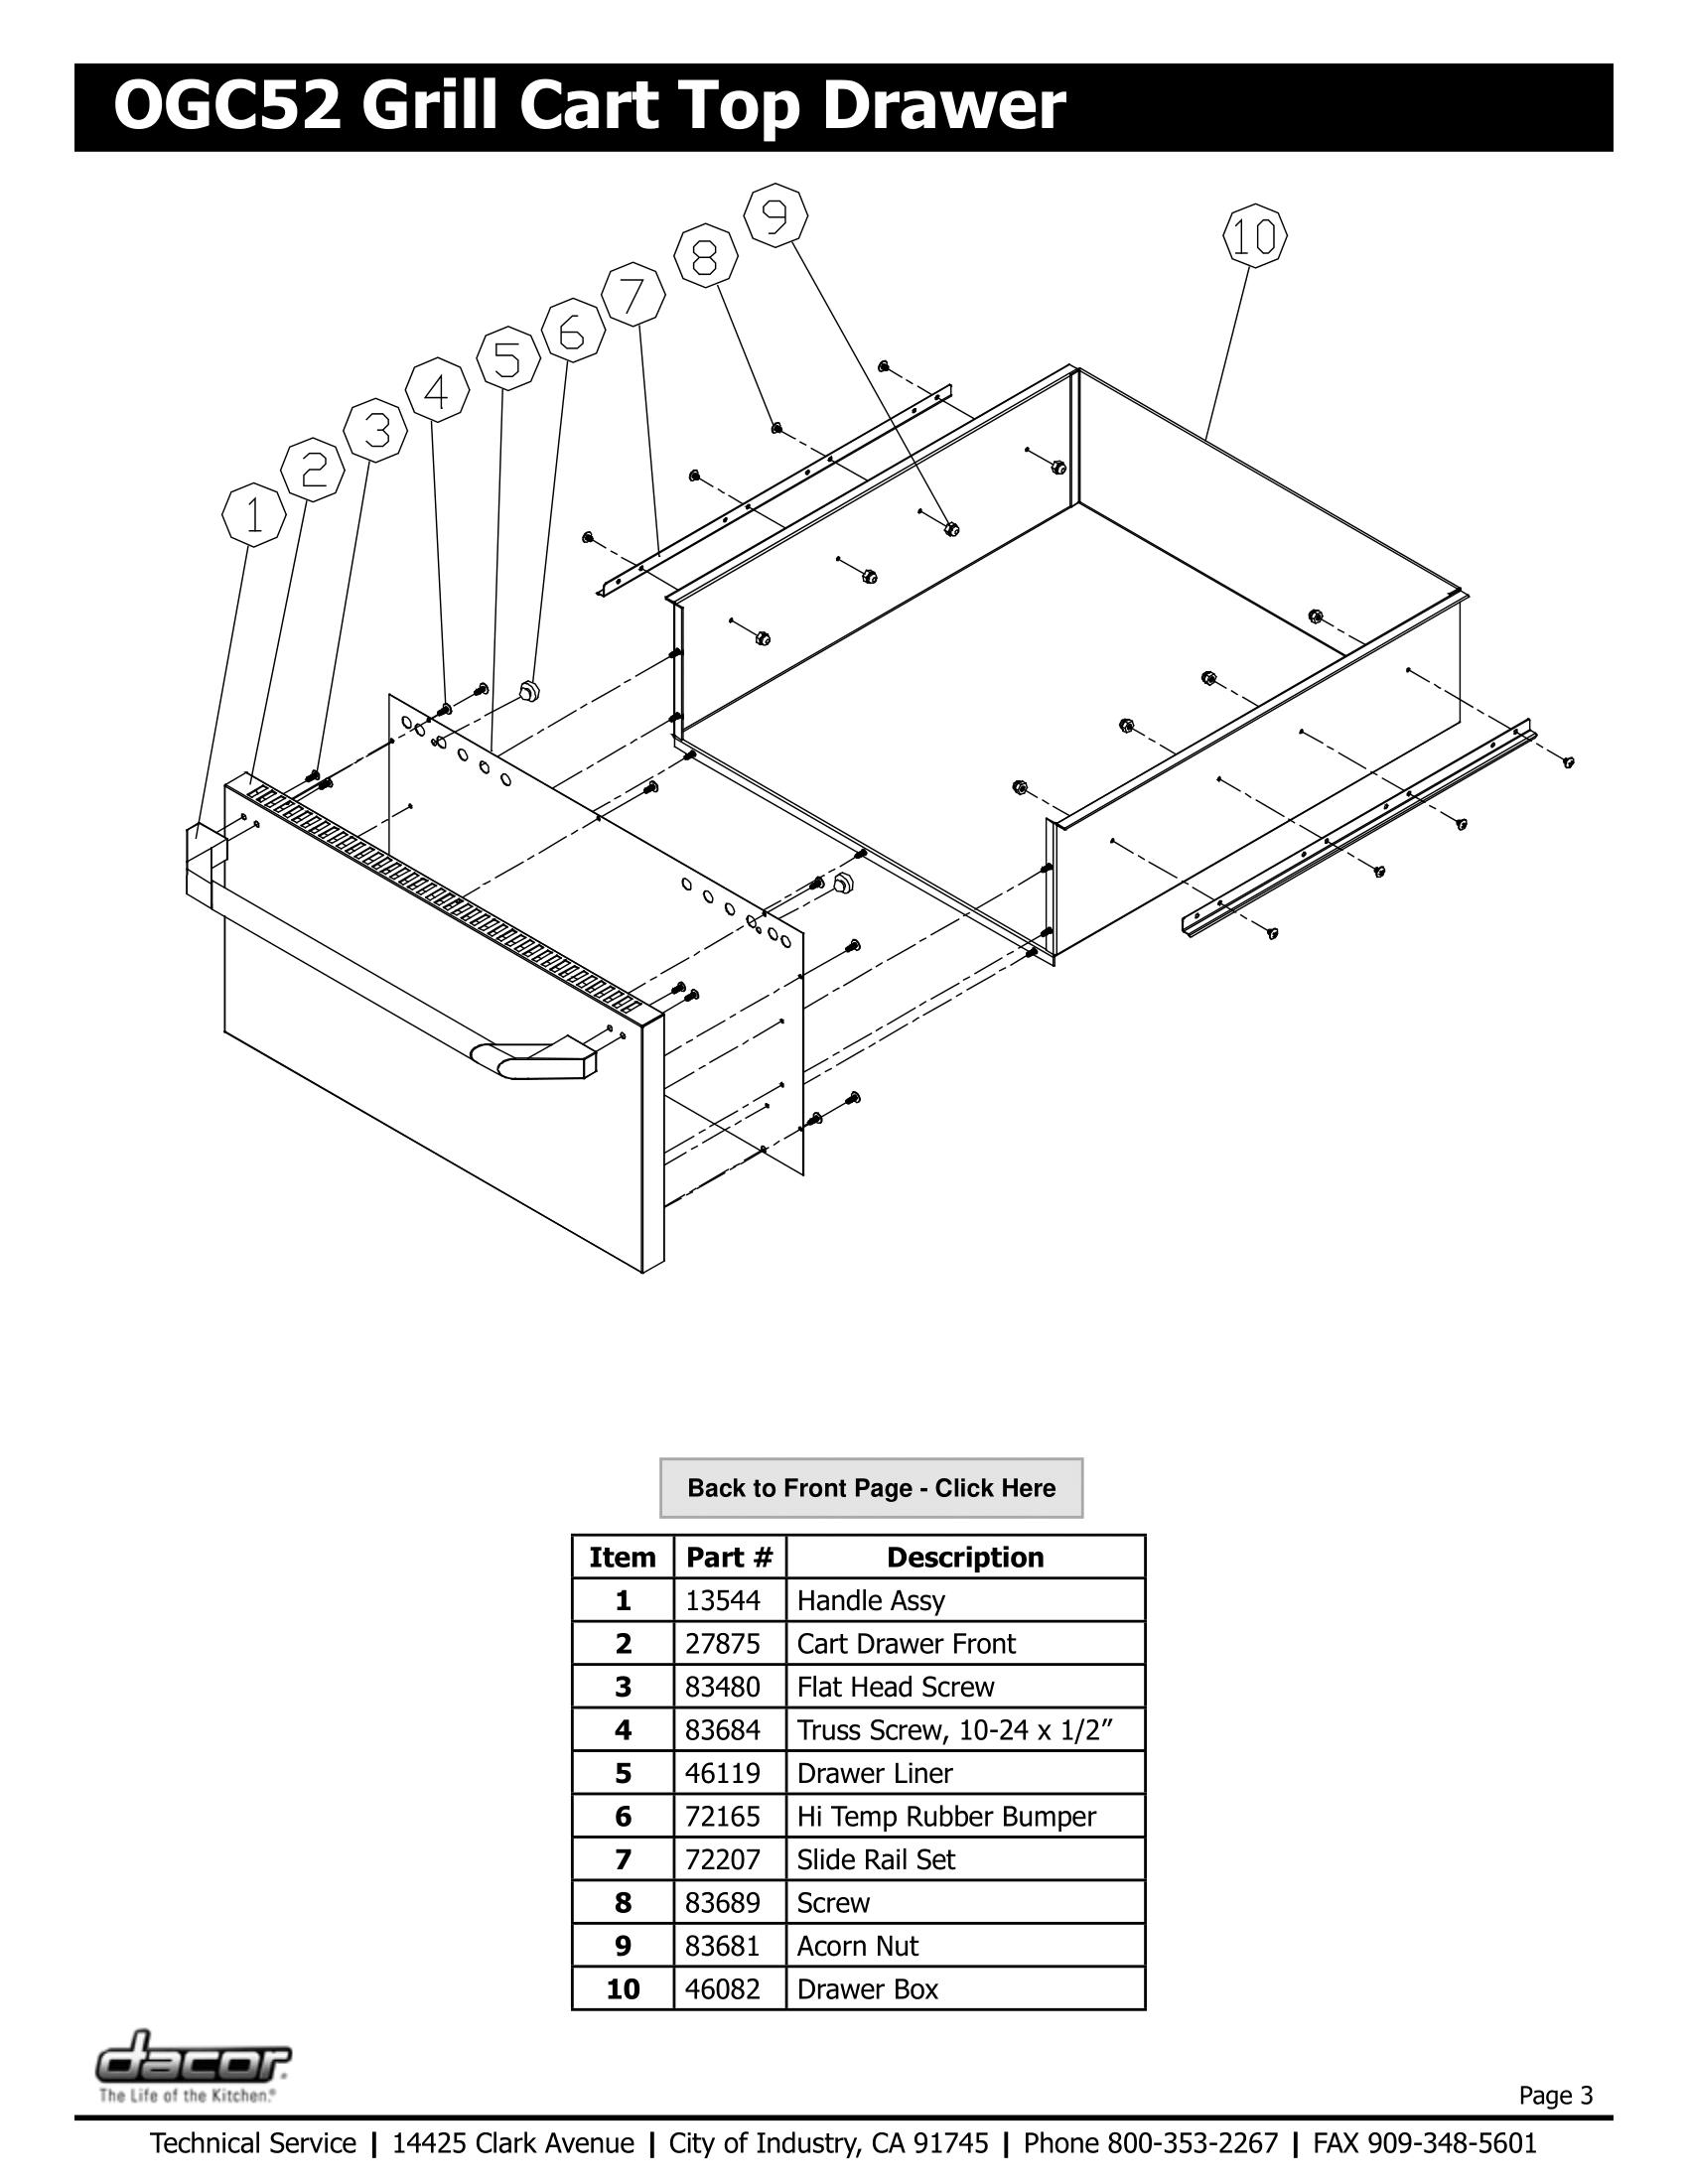 Dacor OGC52 Top Drawer Schematic